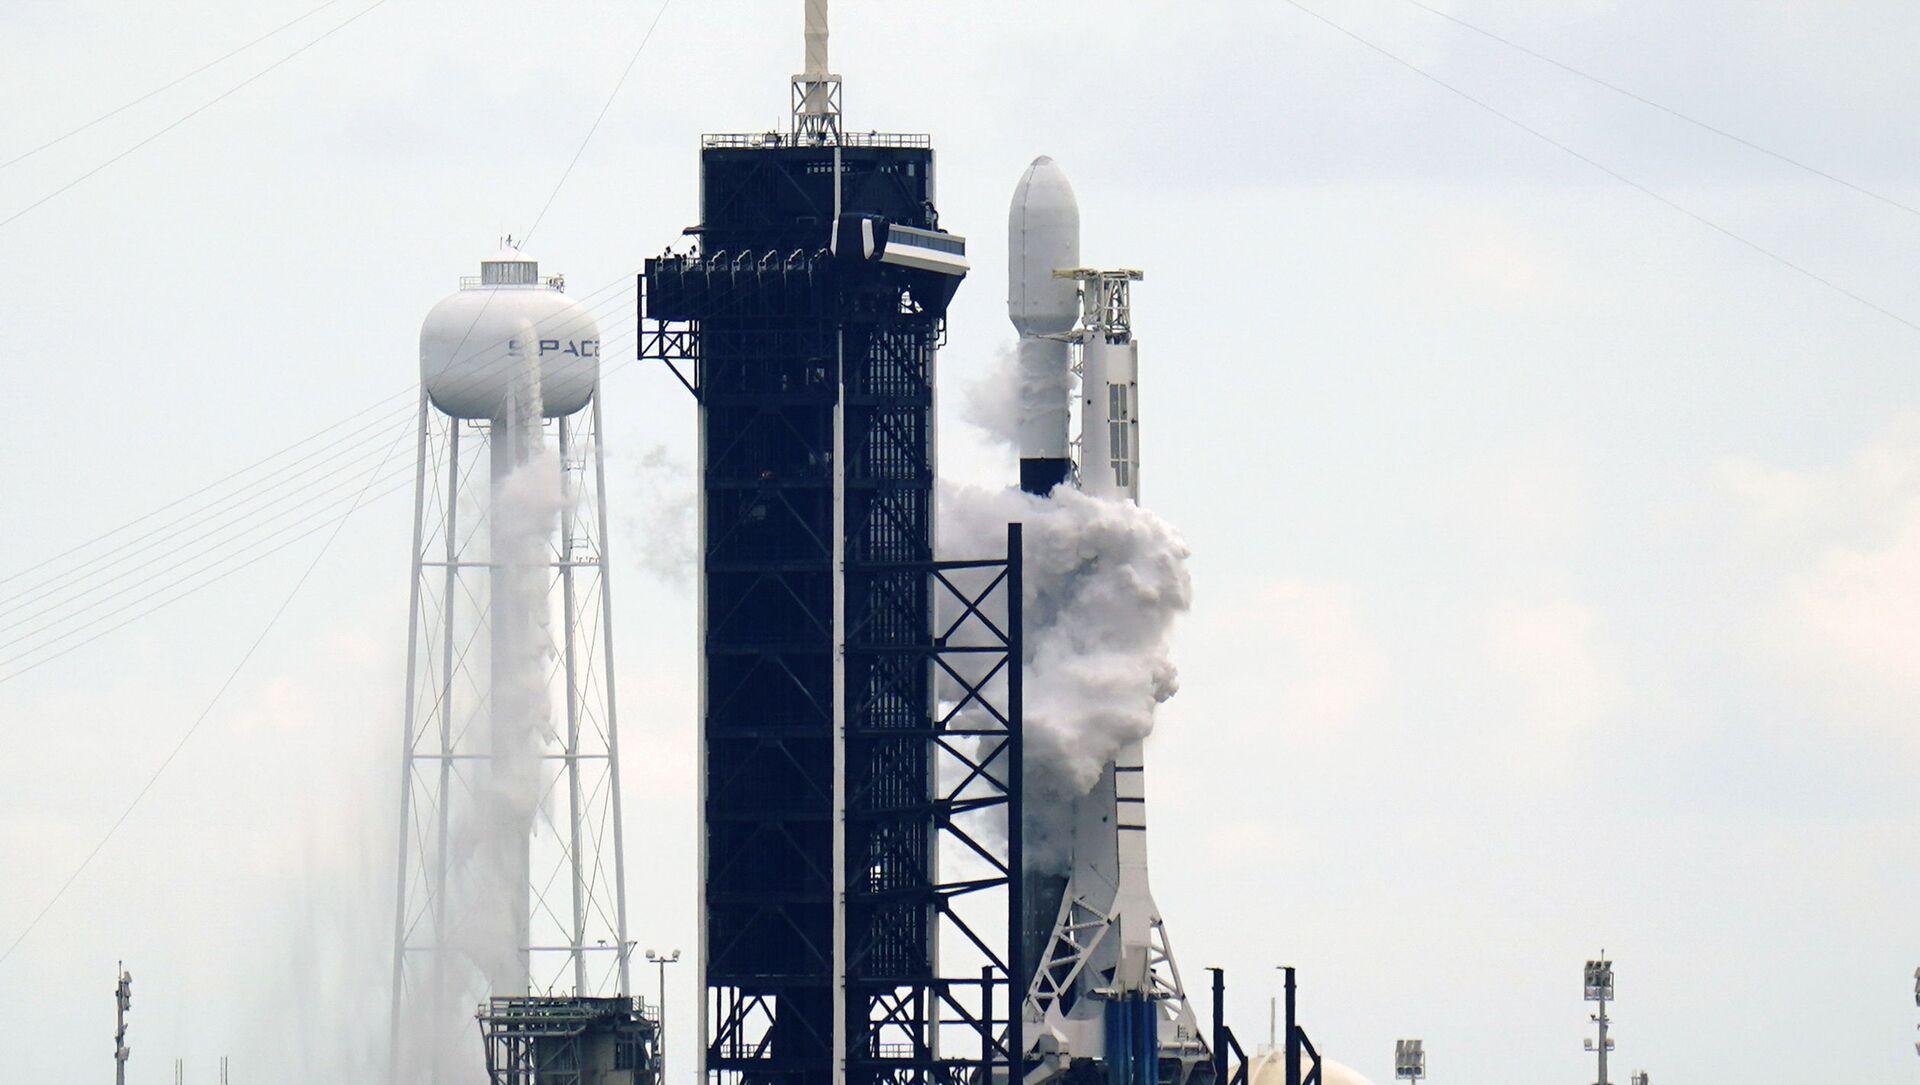 Start rakiety Falcon 9 z kosmodromu Cape Canaveral na Florydzie. - Sputnik Polska, 1920, 14.03.2021